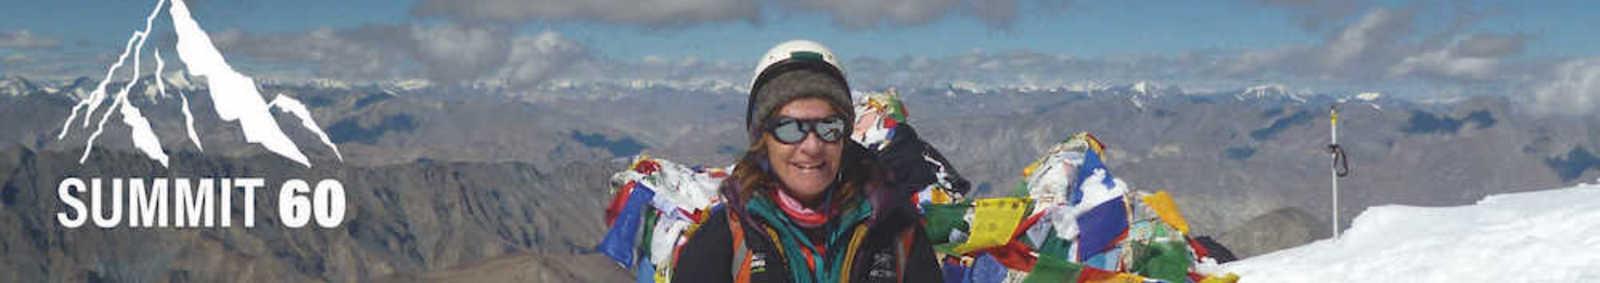 Summit 60 with Valerie Parkinson